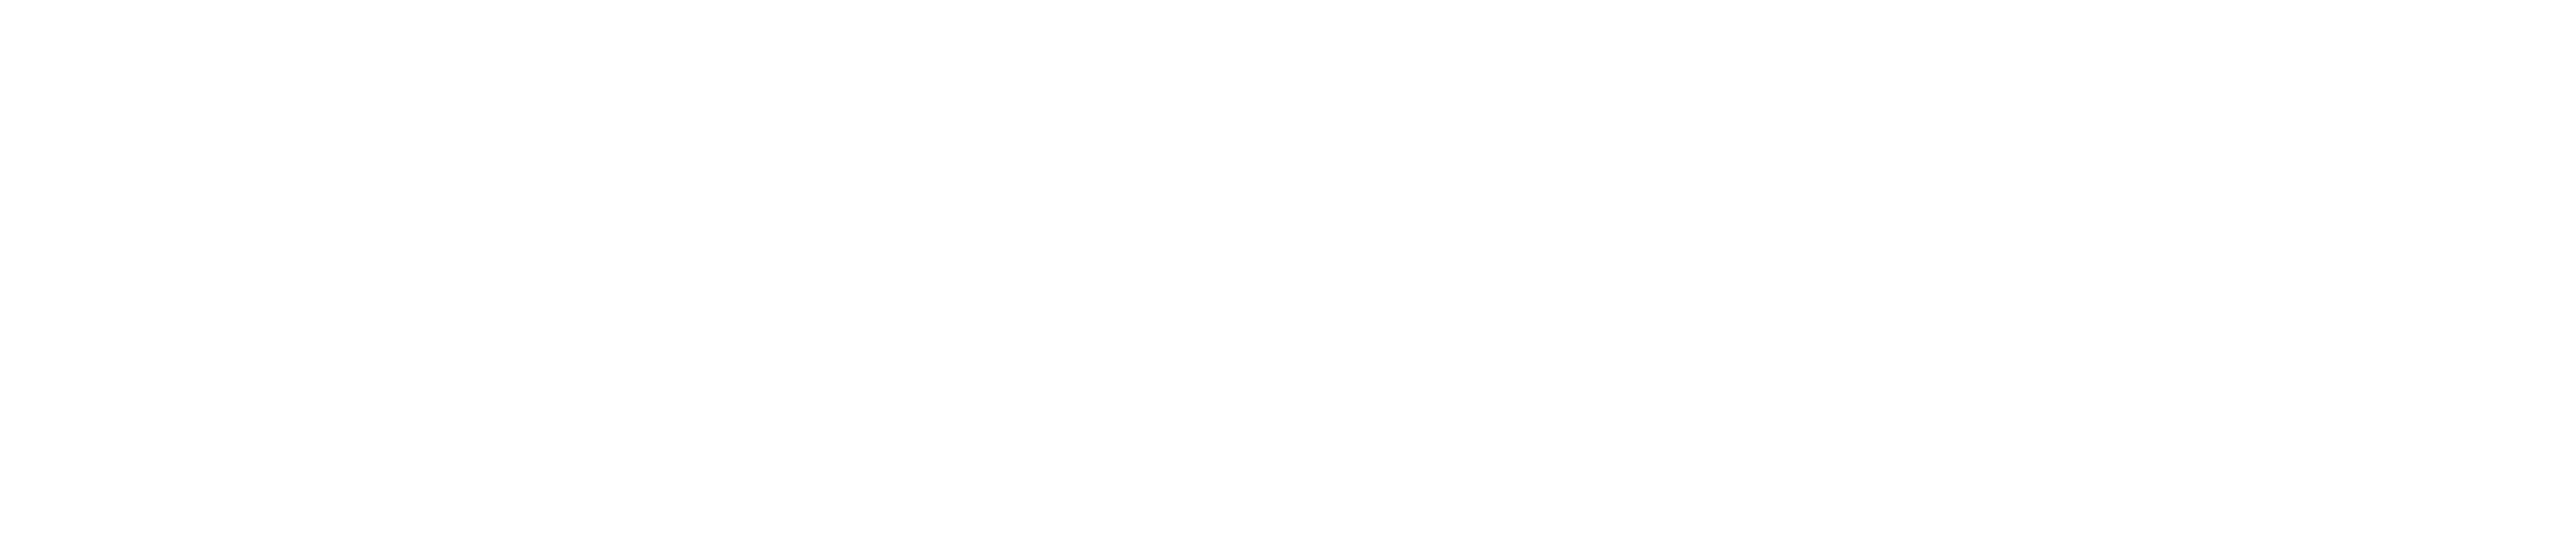 MOTORCYCLE - PLATINUM OIL